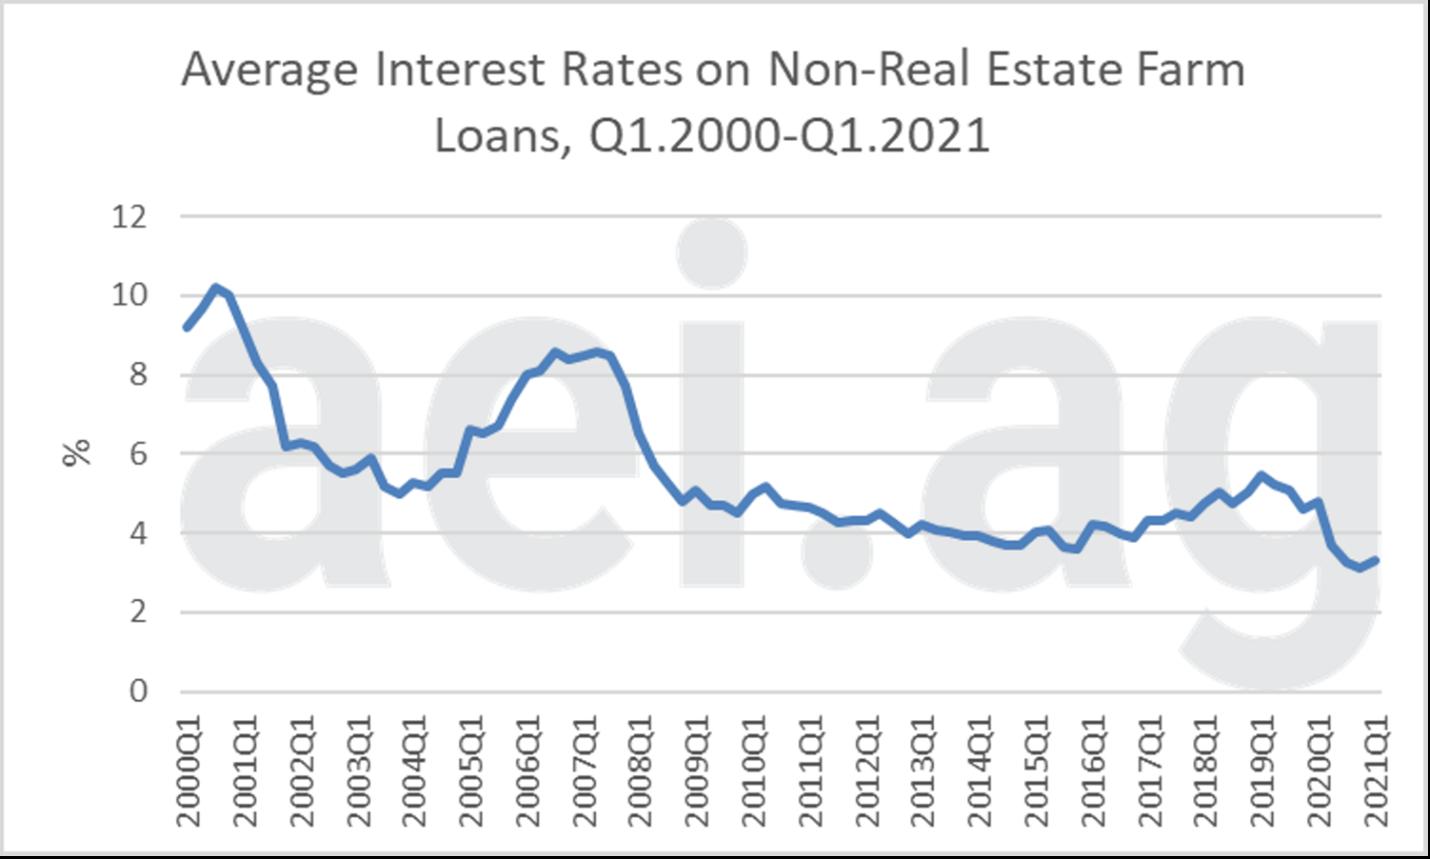 Figure 2. Average Interest Rate on Non-Real Estate Farm Loans, Q1 2020 – Q1 2021. Data Source: Kansas City Federal Reserve, Ag Finance Databook.